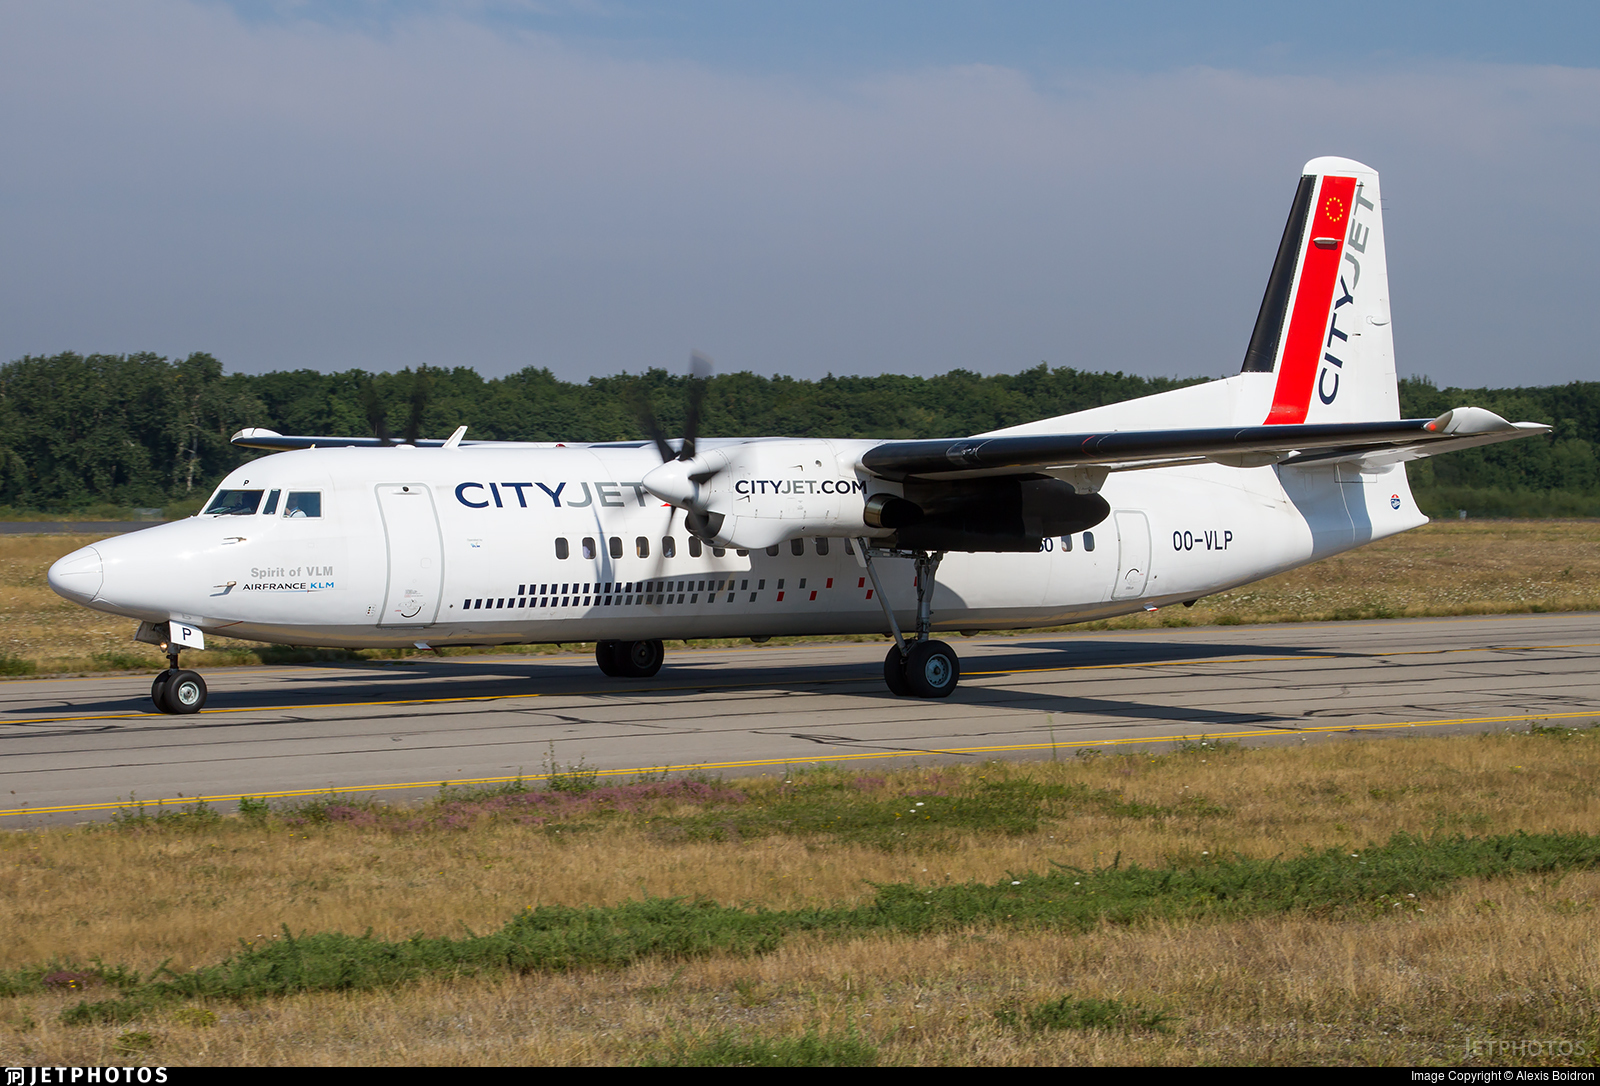 OO-VLP - Fokker 50 - CityJet